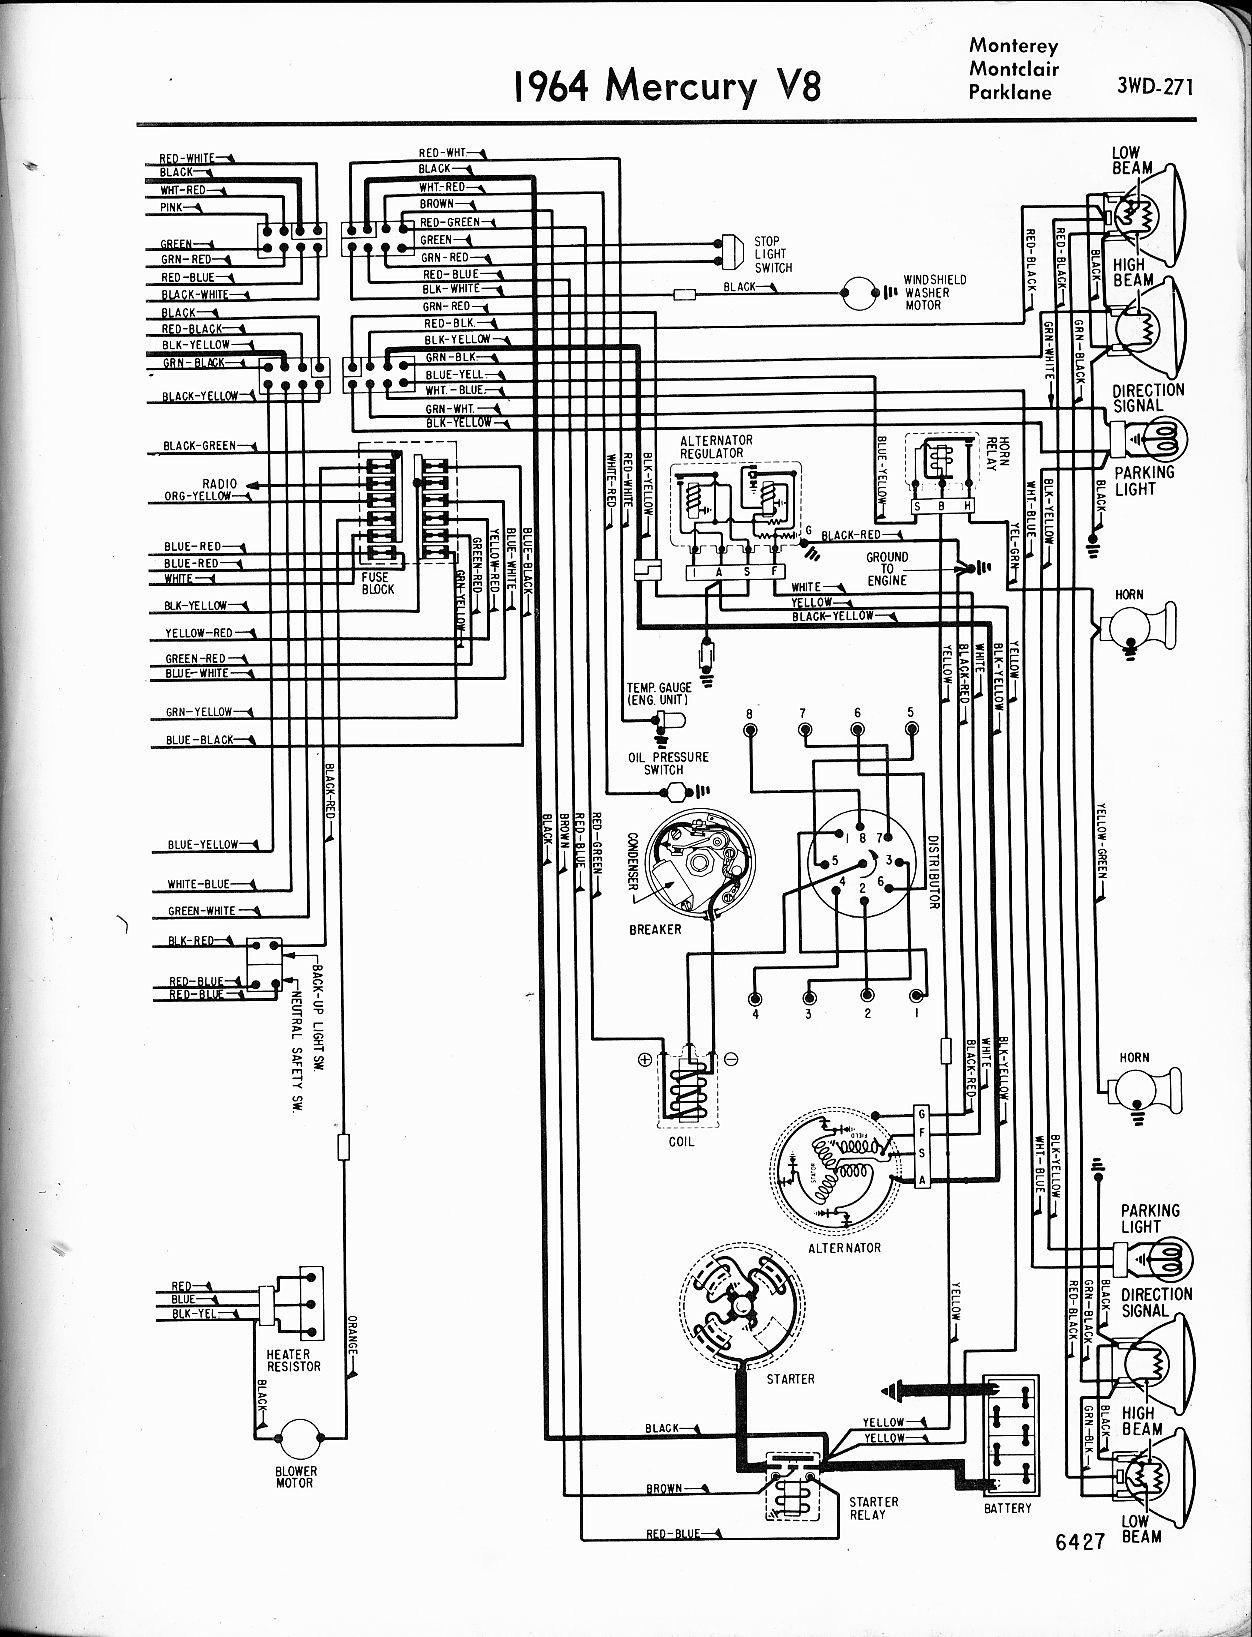 Mercury Outboard Rectifier Wiring Diagram - Auto Electrical Wiring - Mercury Outboard Rectifier Wiring Diagram